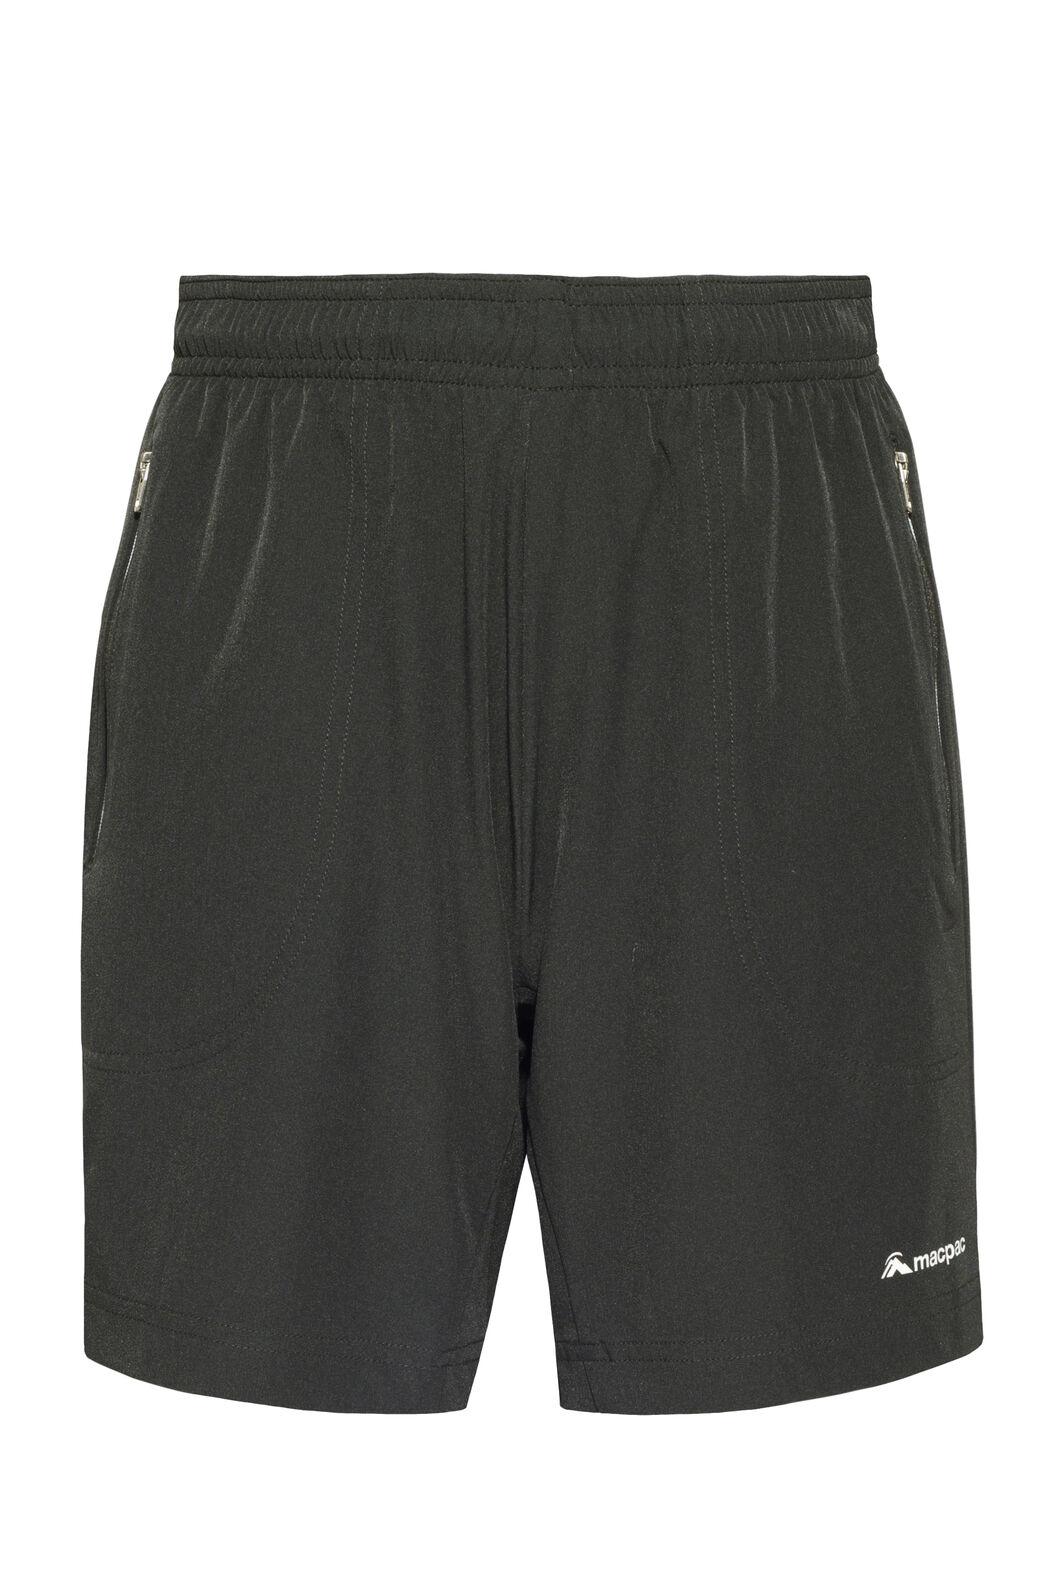 Macpac Fast Track Shorts — Kids', Black, hi-res